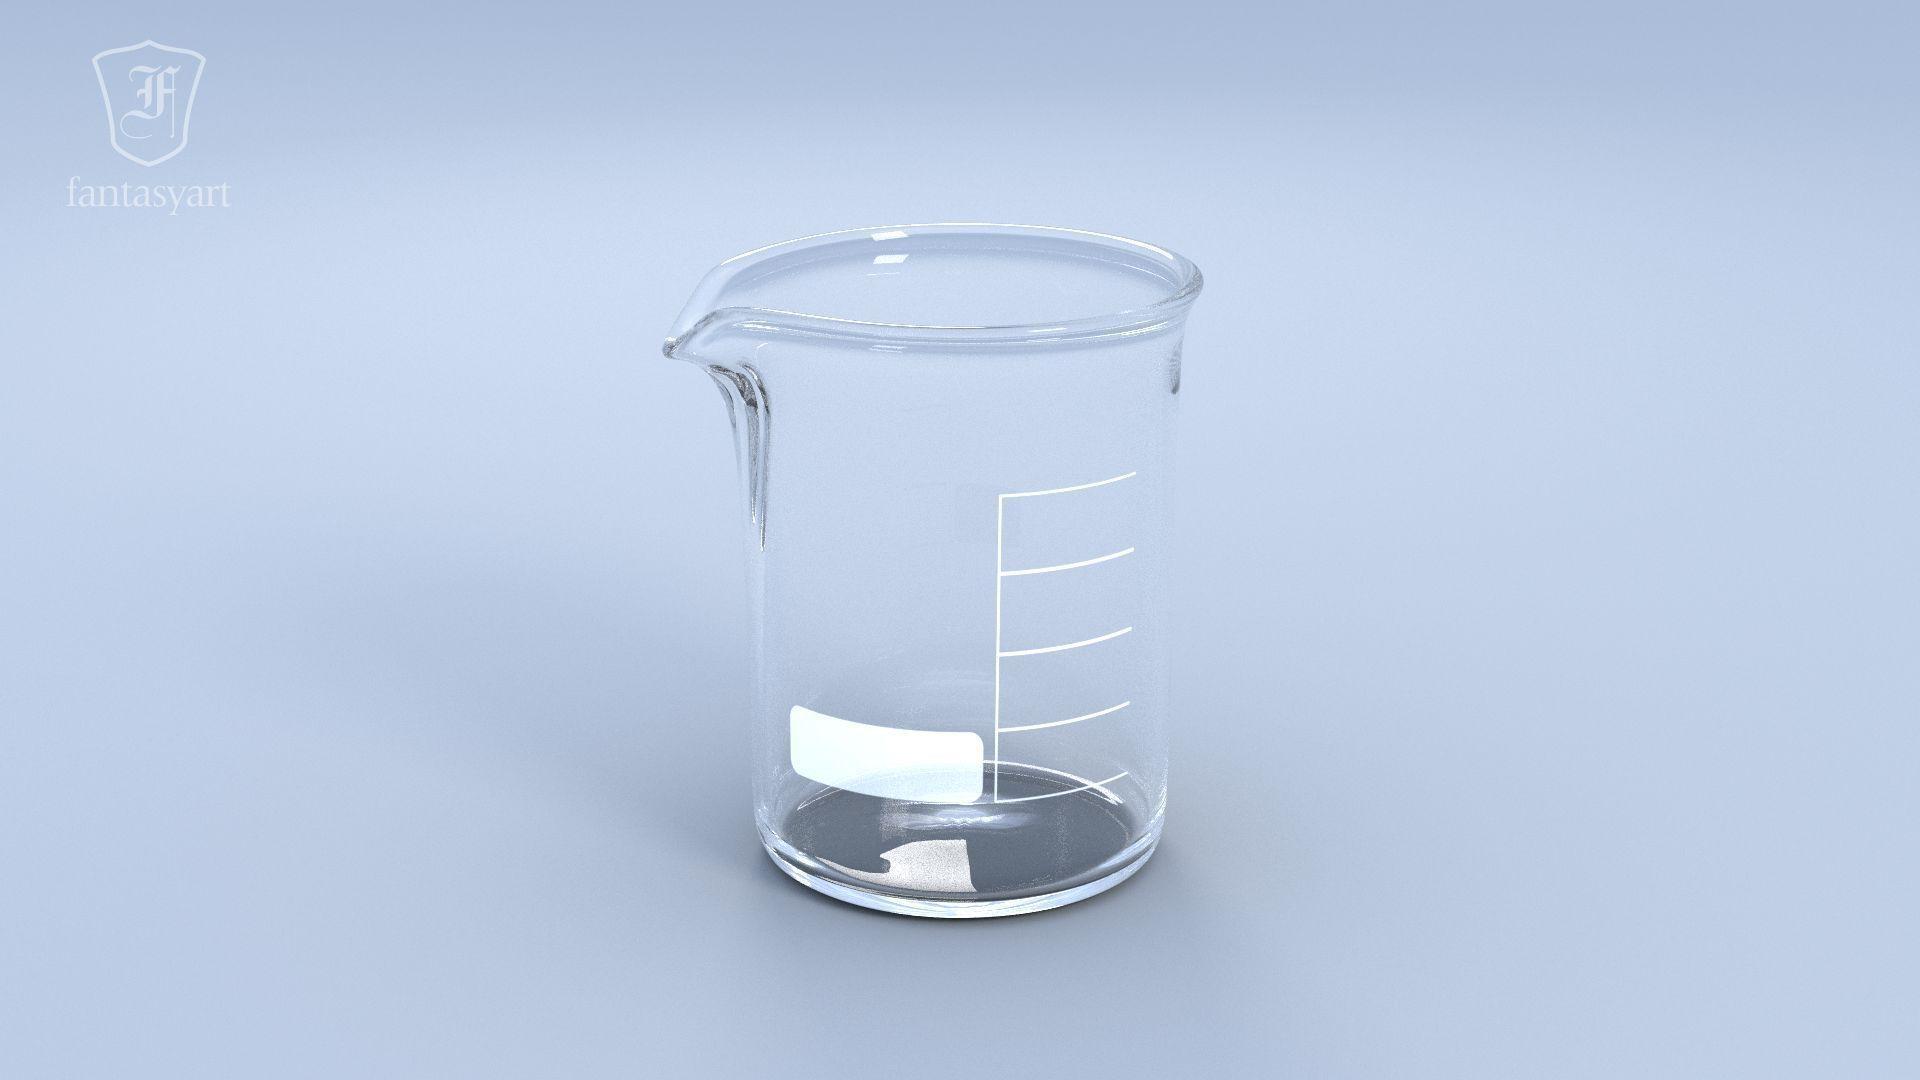 Chemical Laboratory Glassware Set 3d Model Obj Fbx